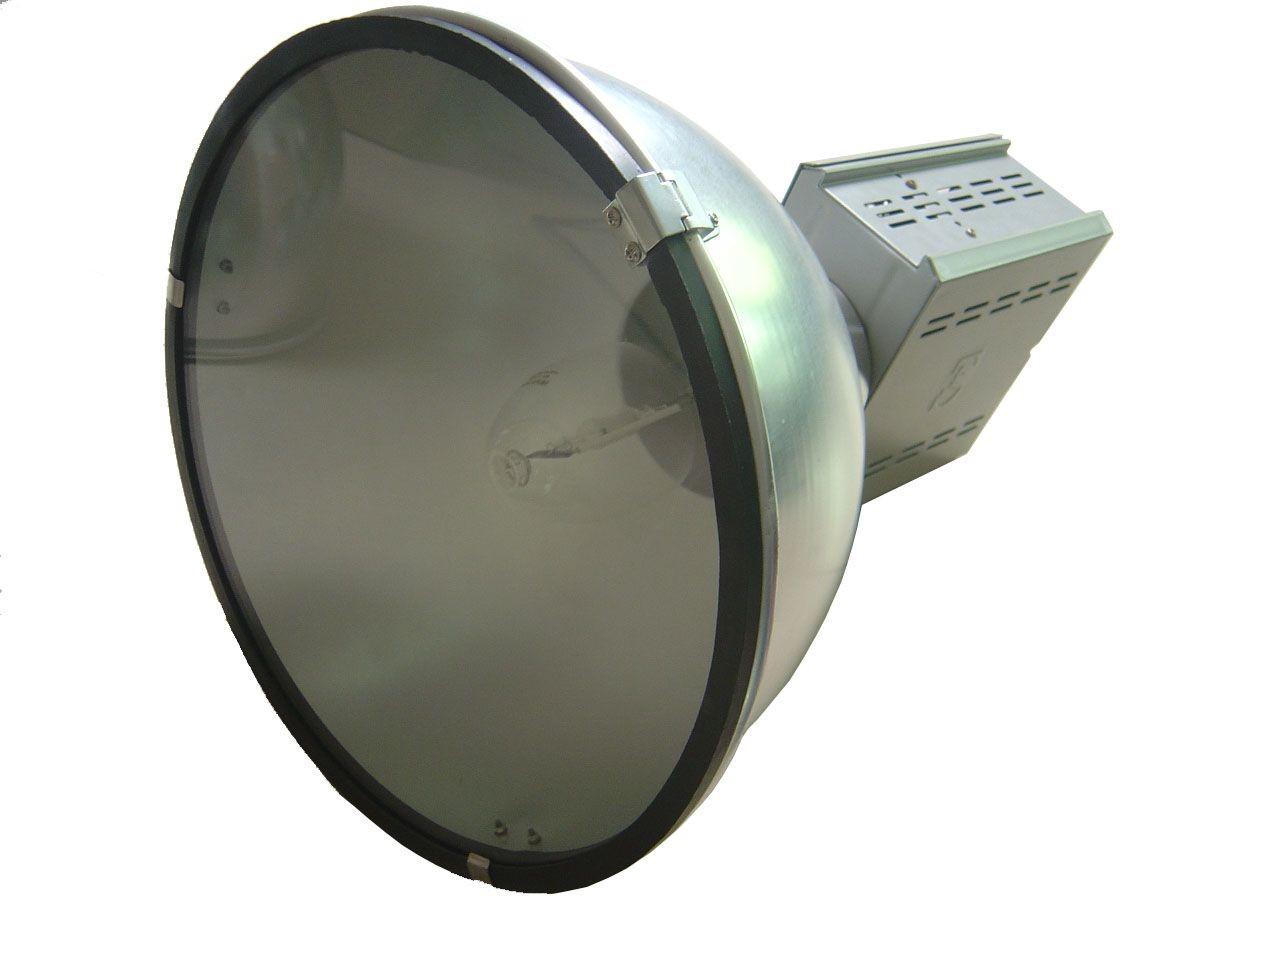 Landlite Dlp 250 250w 230v E40 Ip65 High Bay Light With